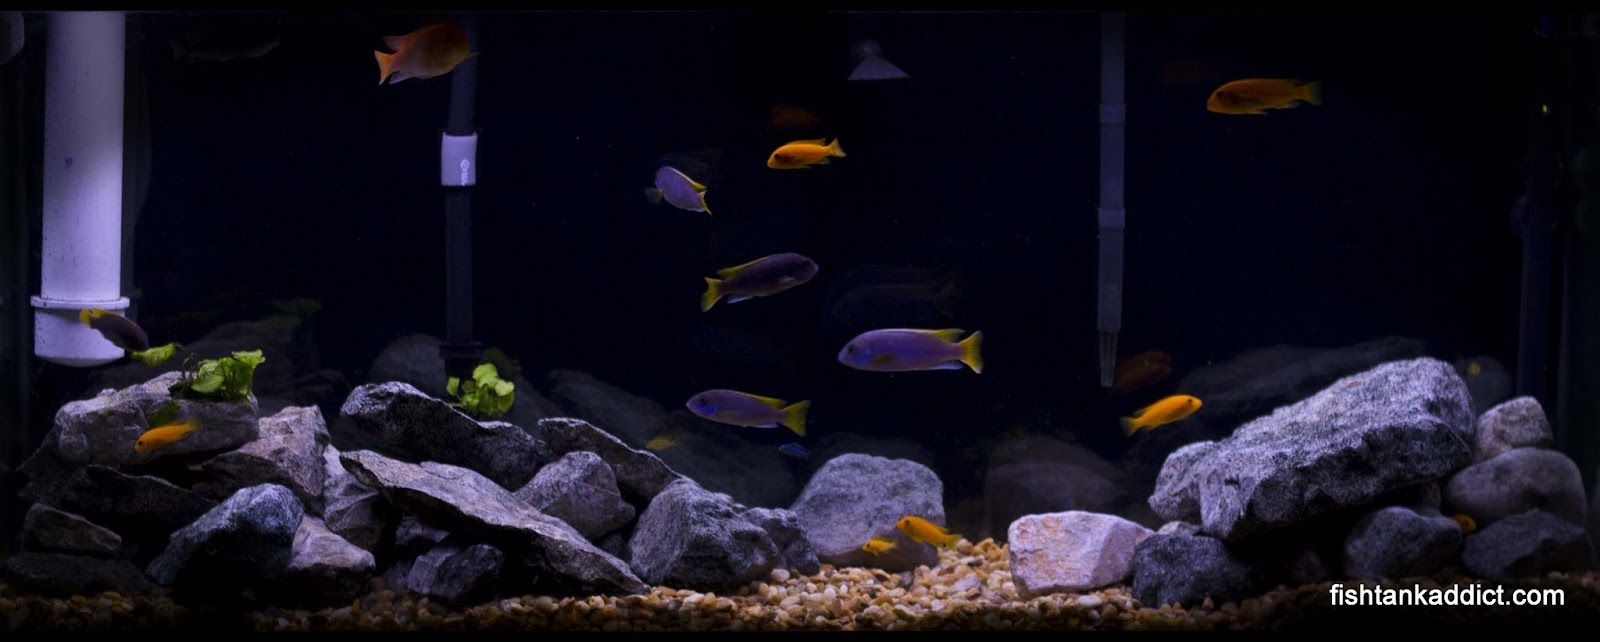 African cichlid tank fish tank addict for Cichlid fish tank